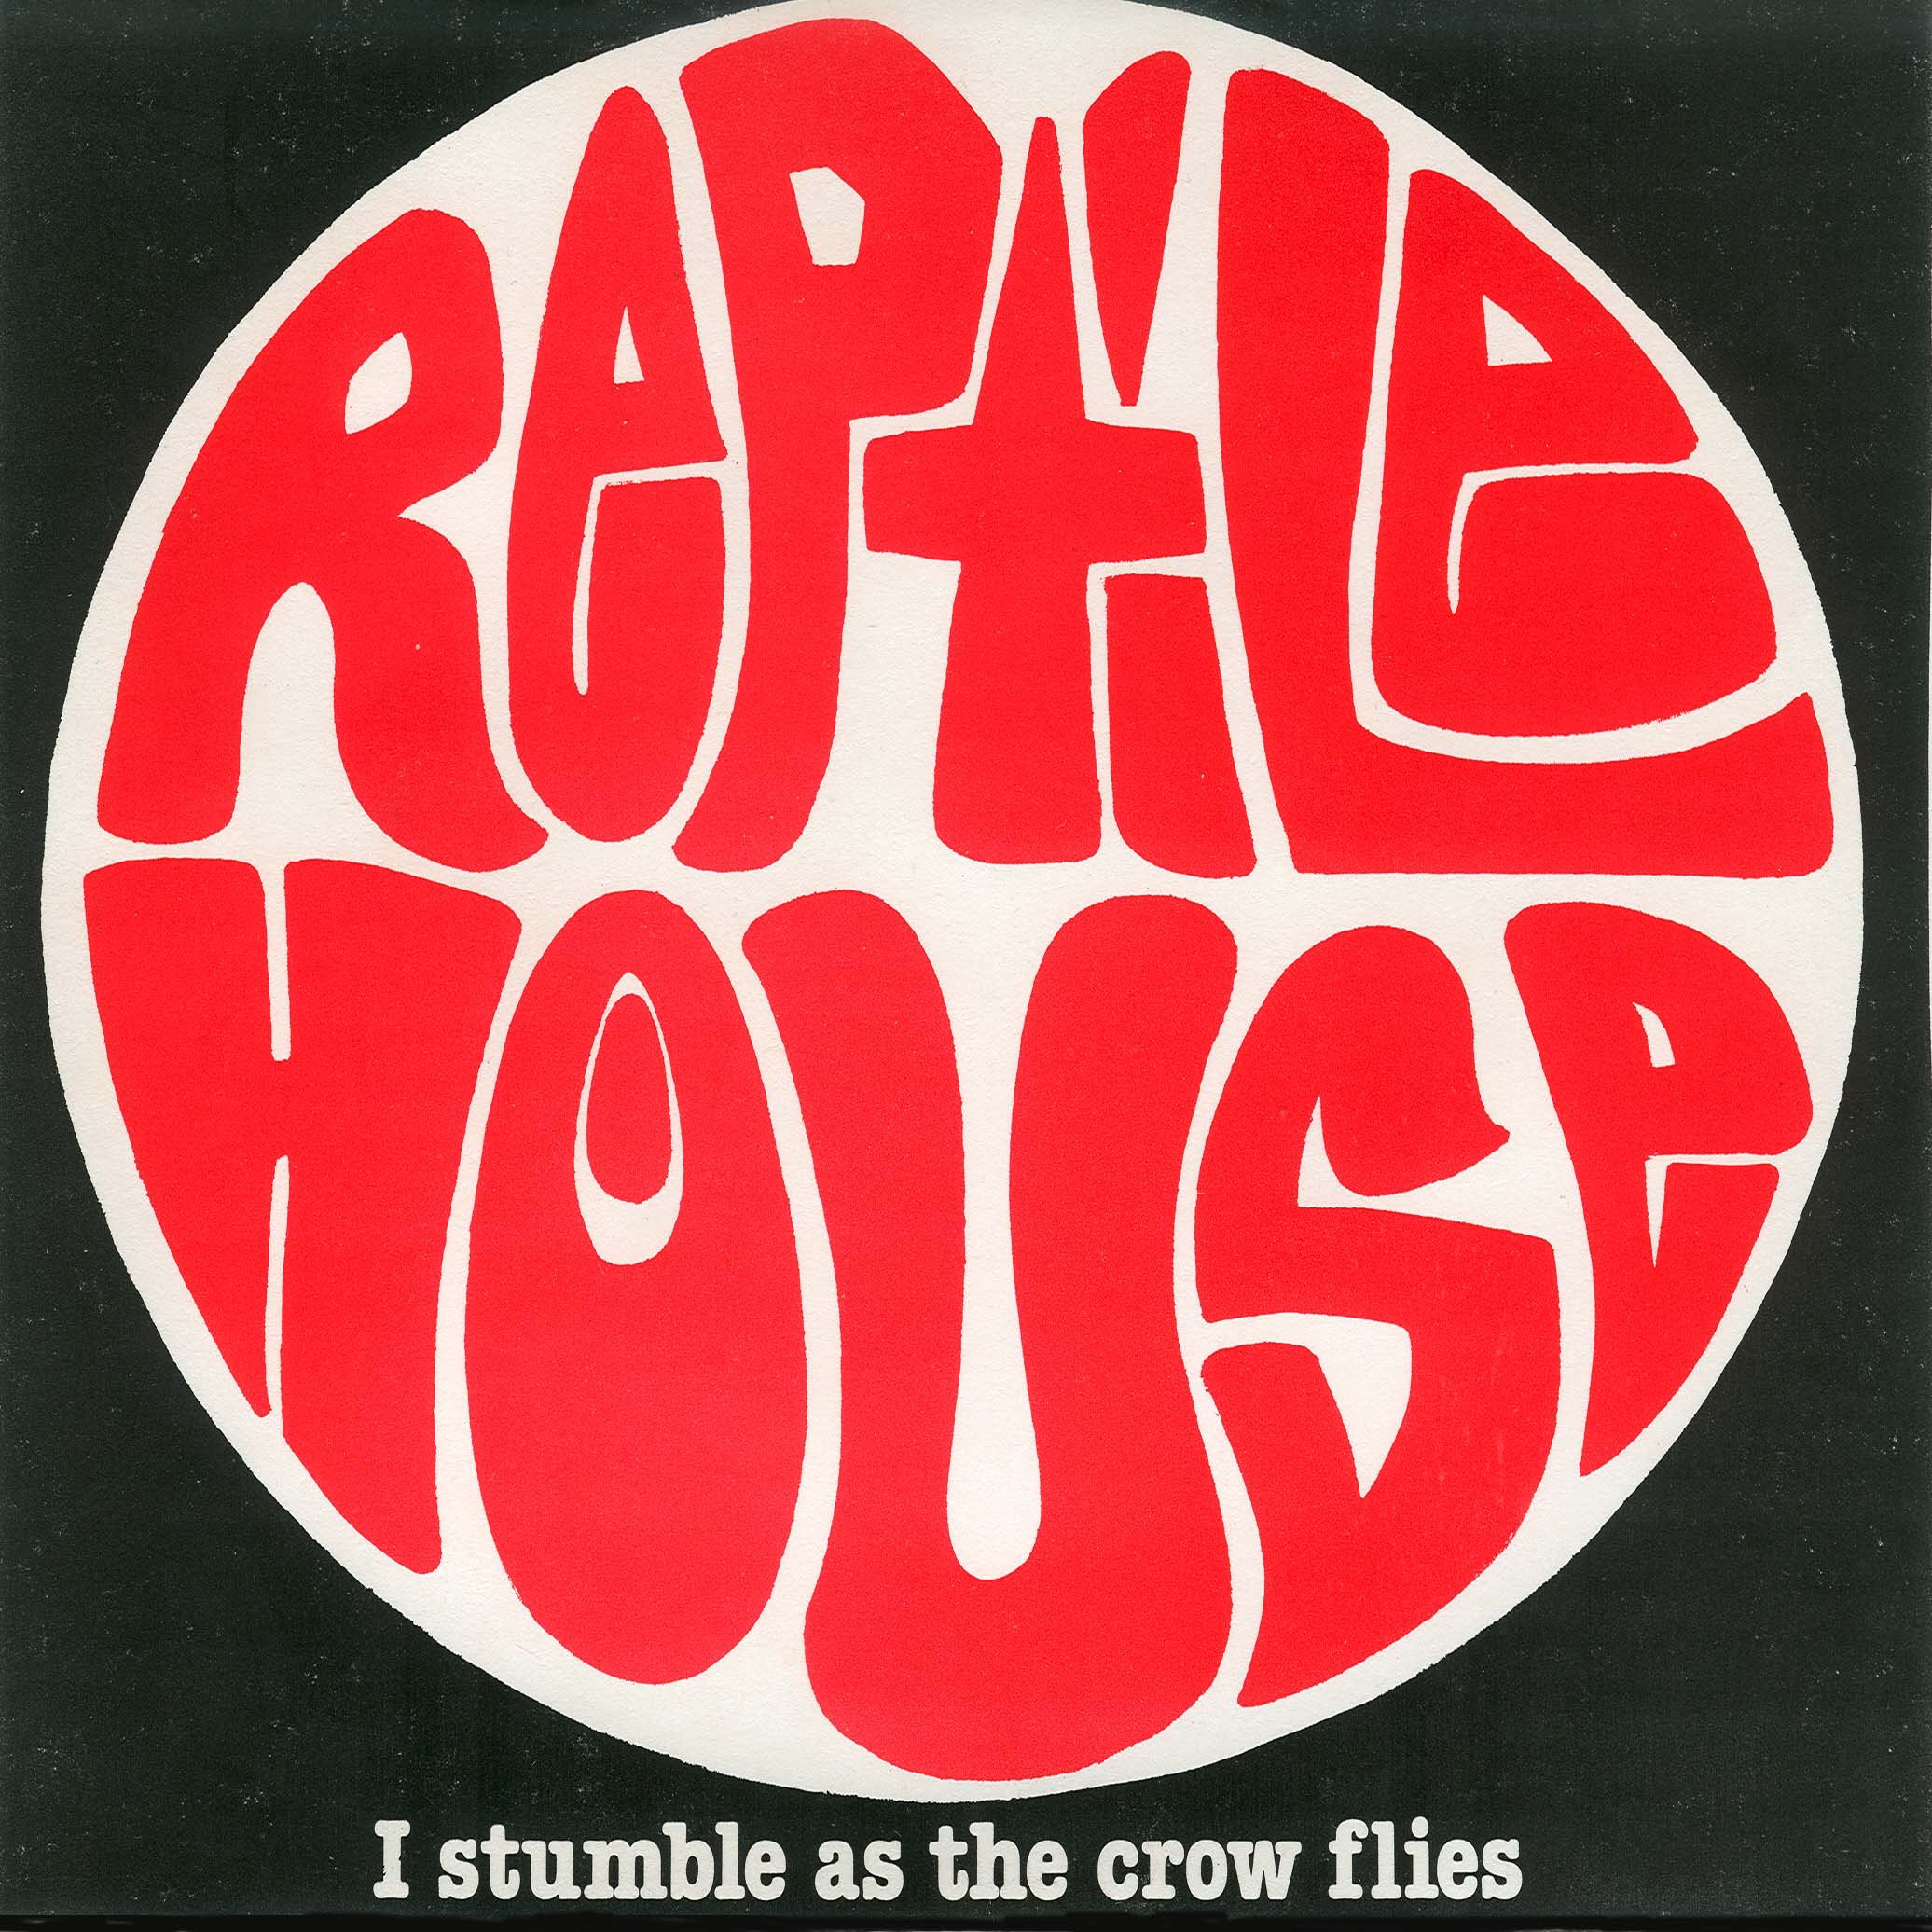 RHouse-stumble 7.jpg